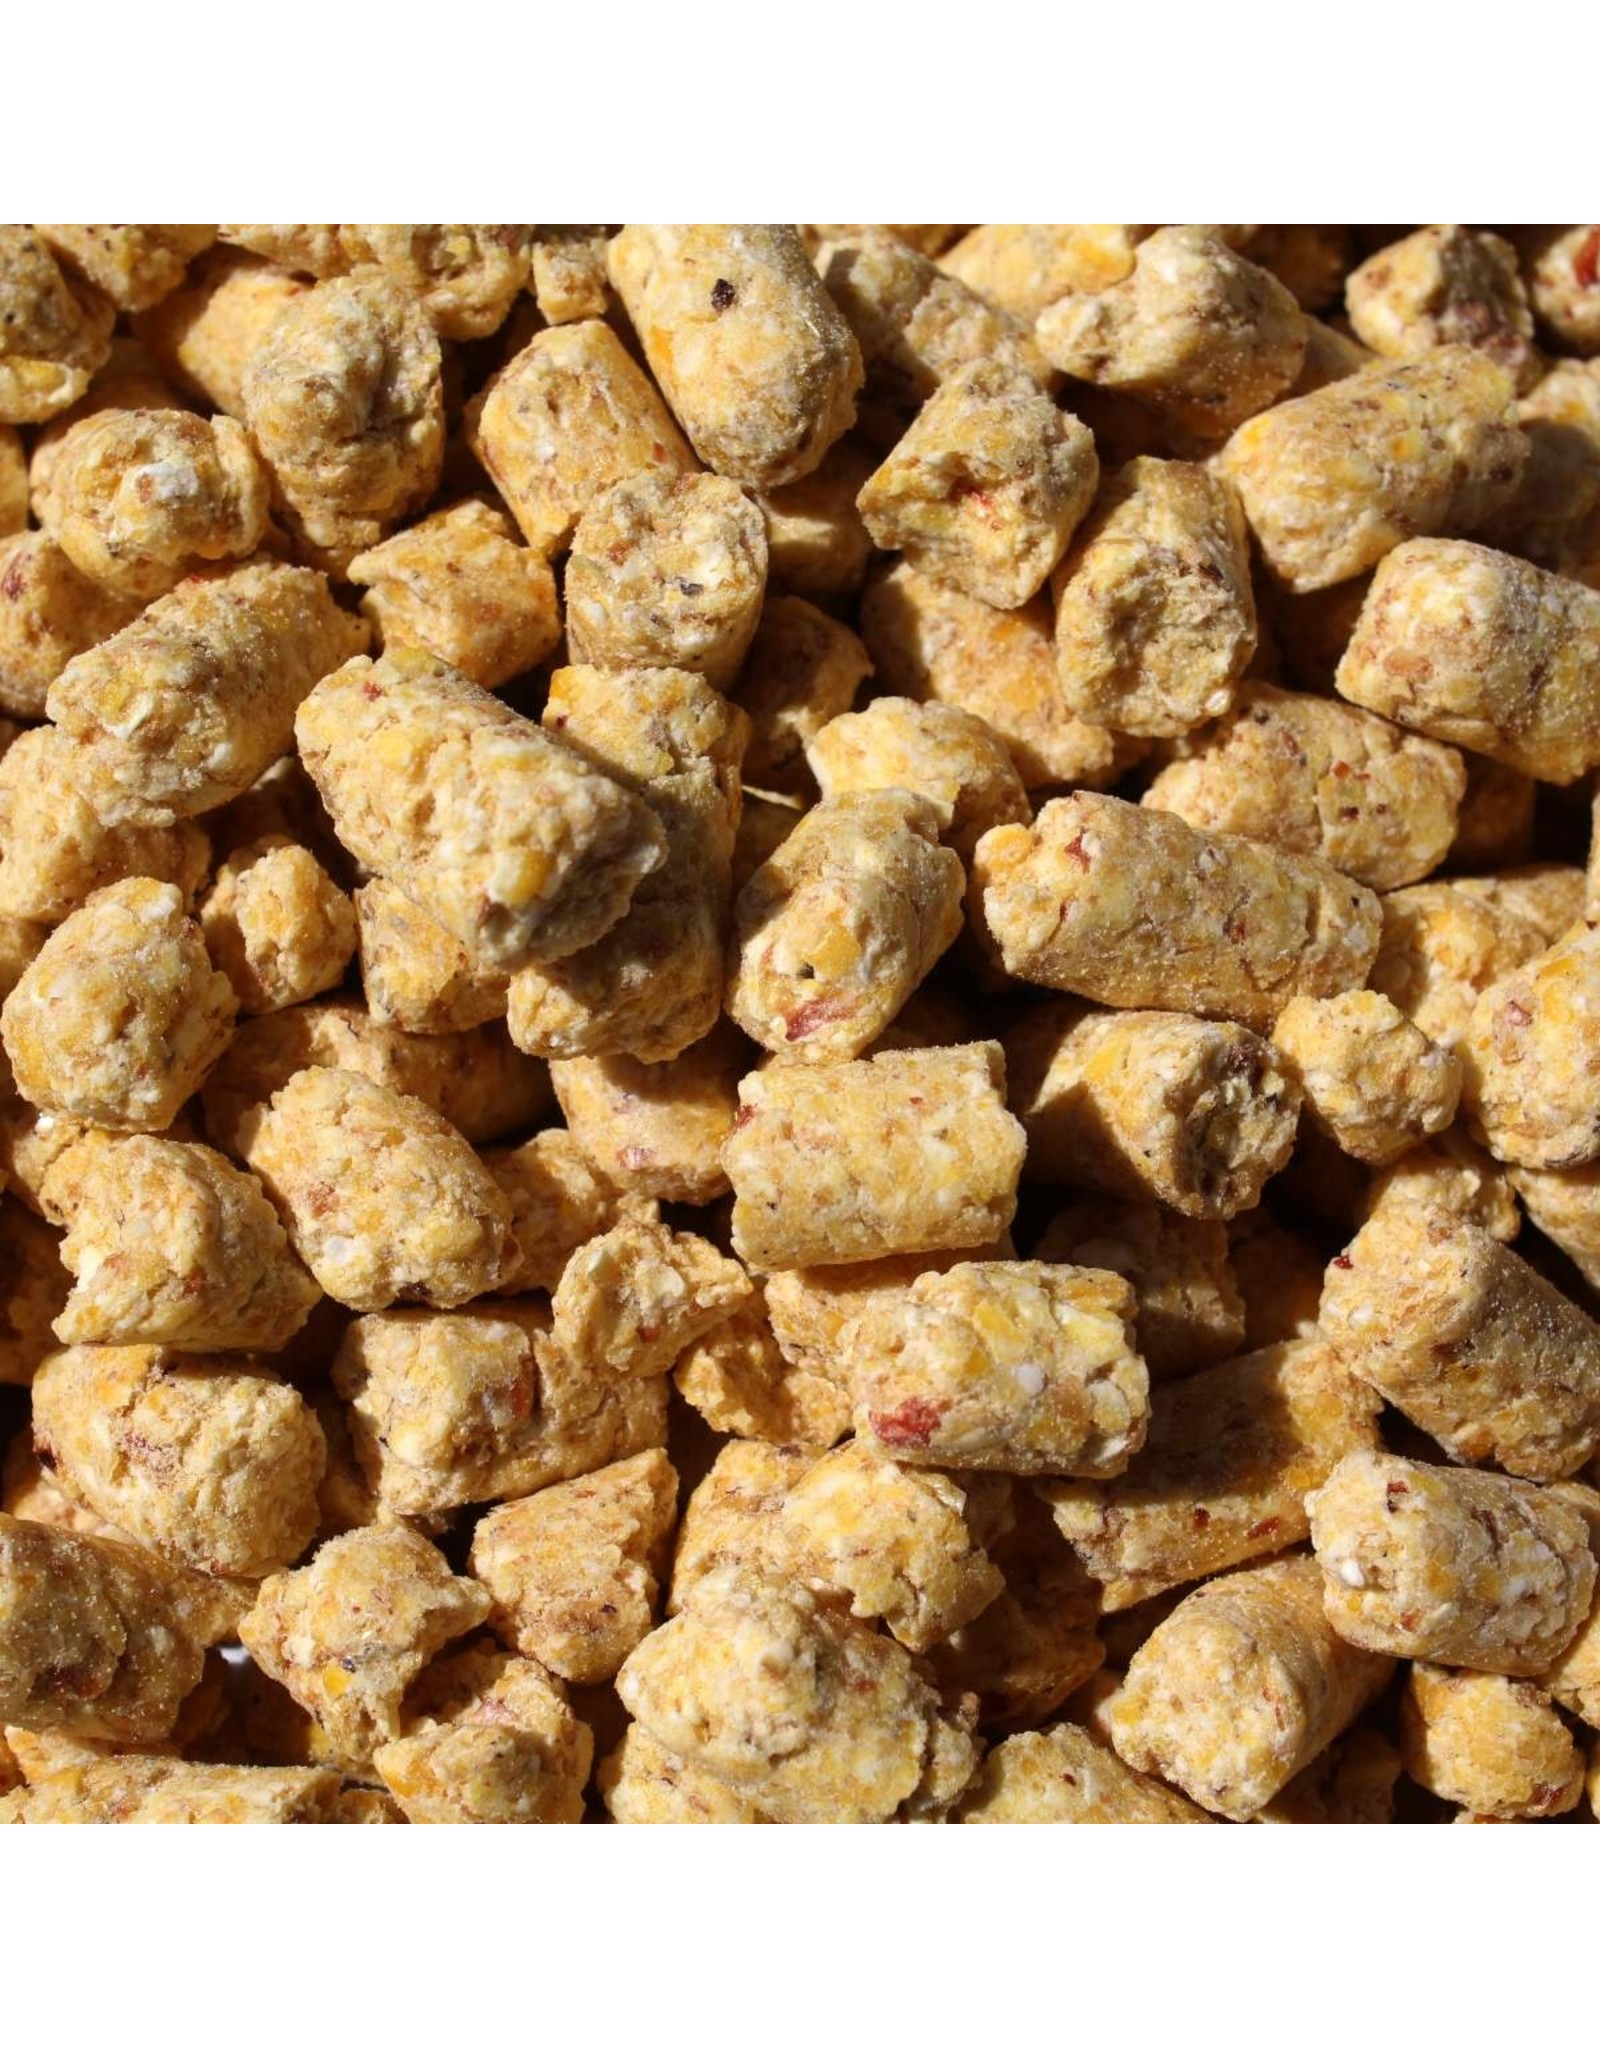 BFM Baits Babycorn pellets